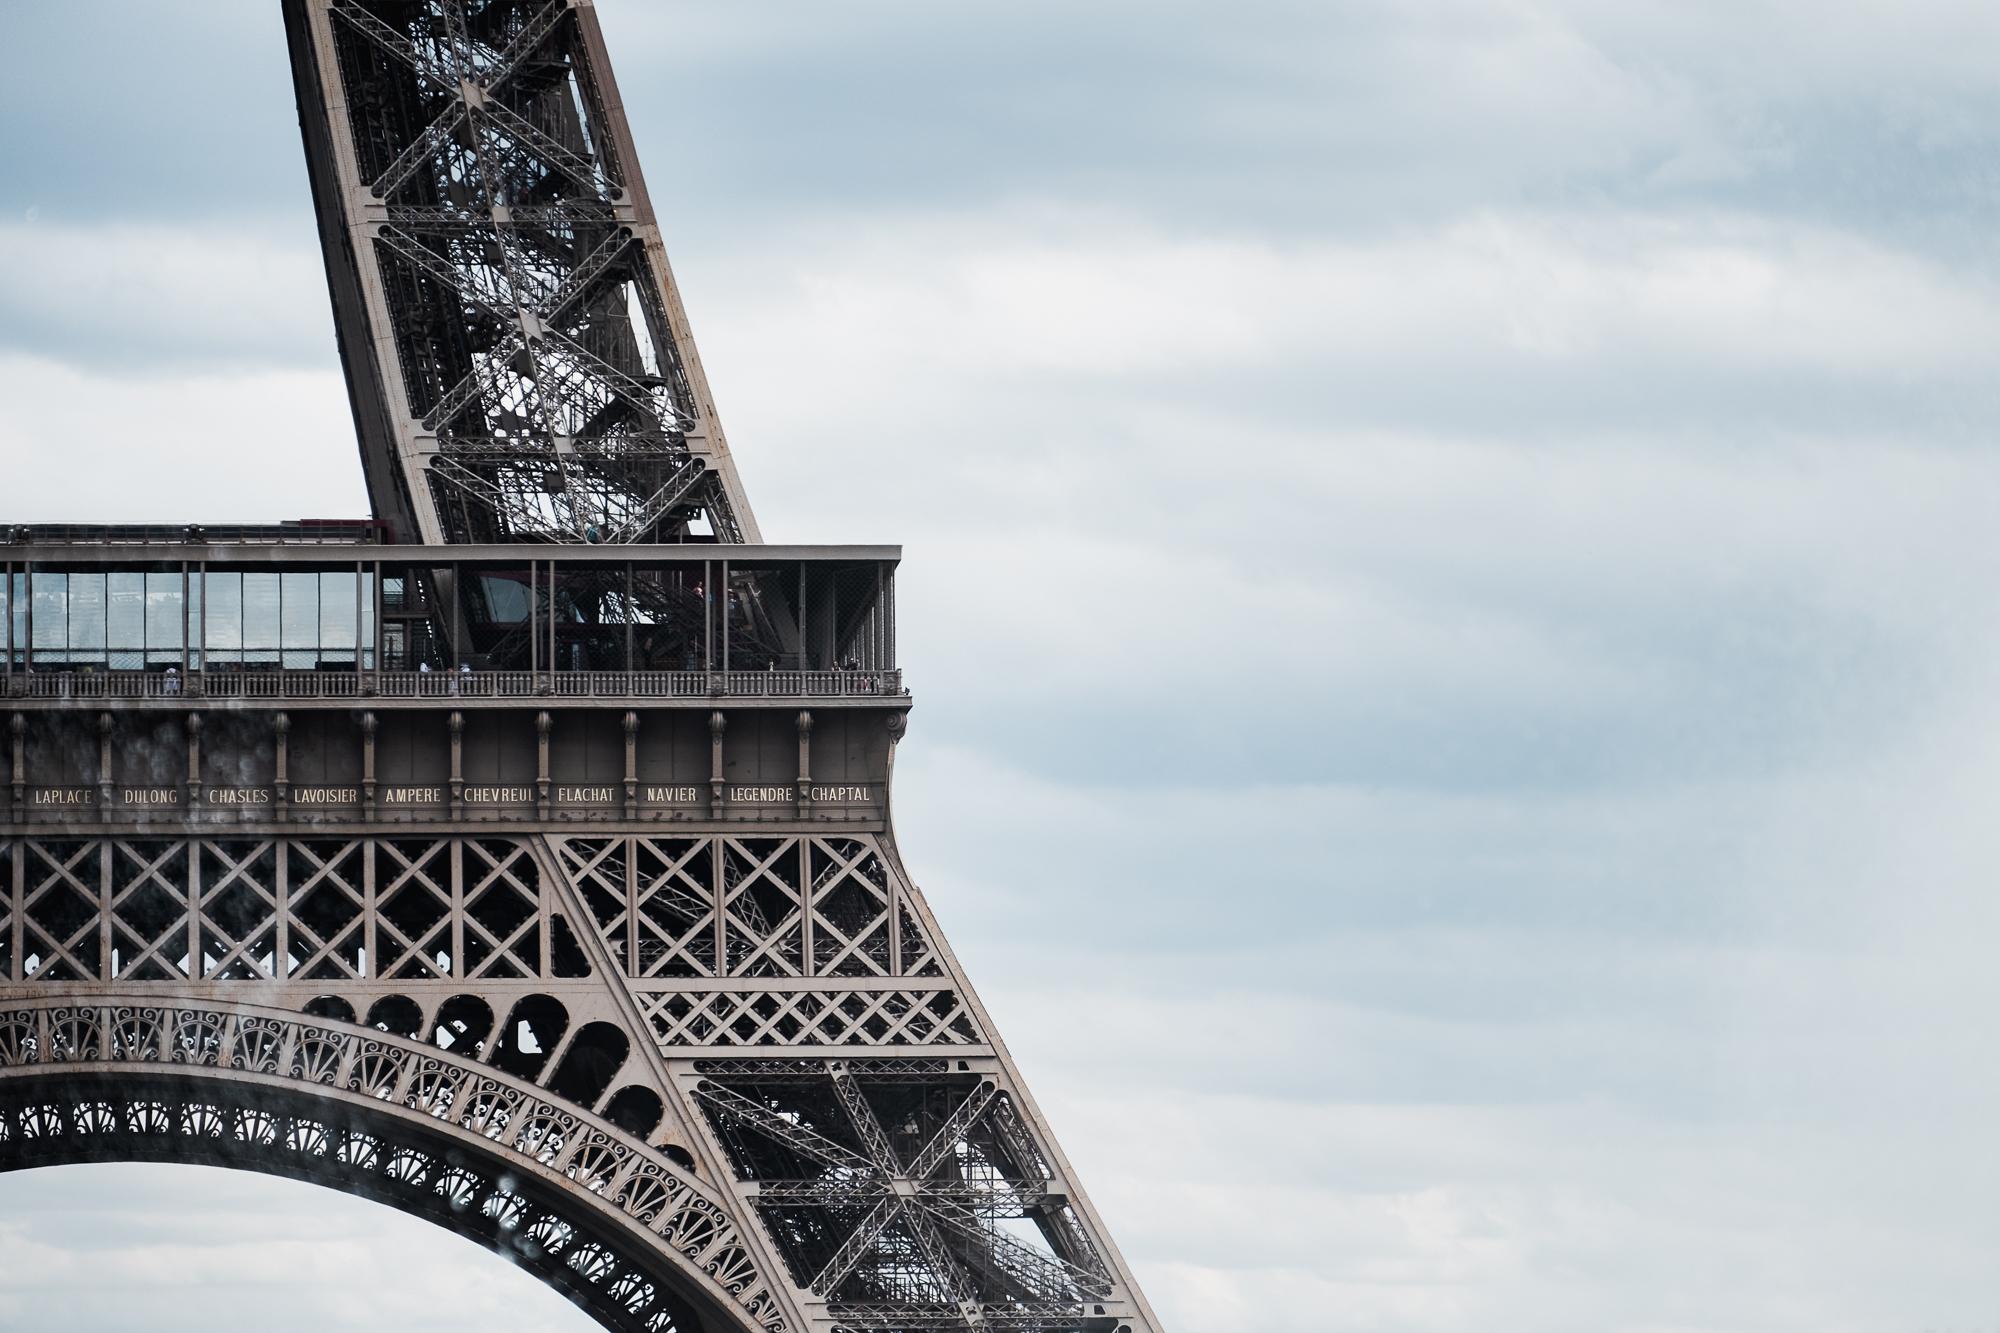 TS -180731 - Paris - 028.jpg